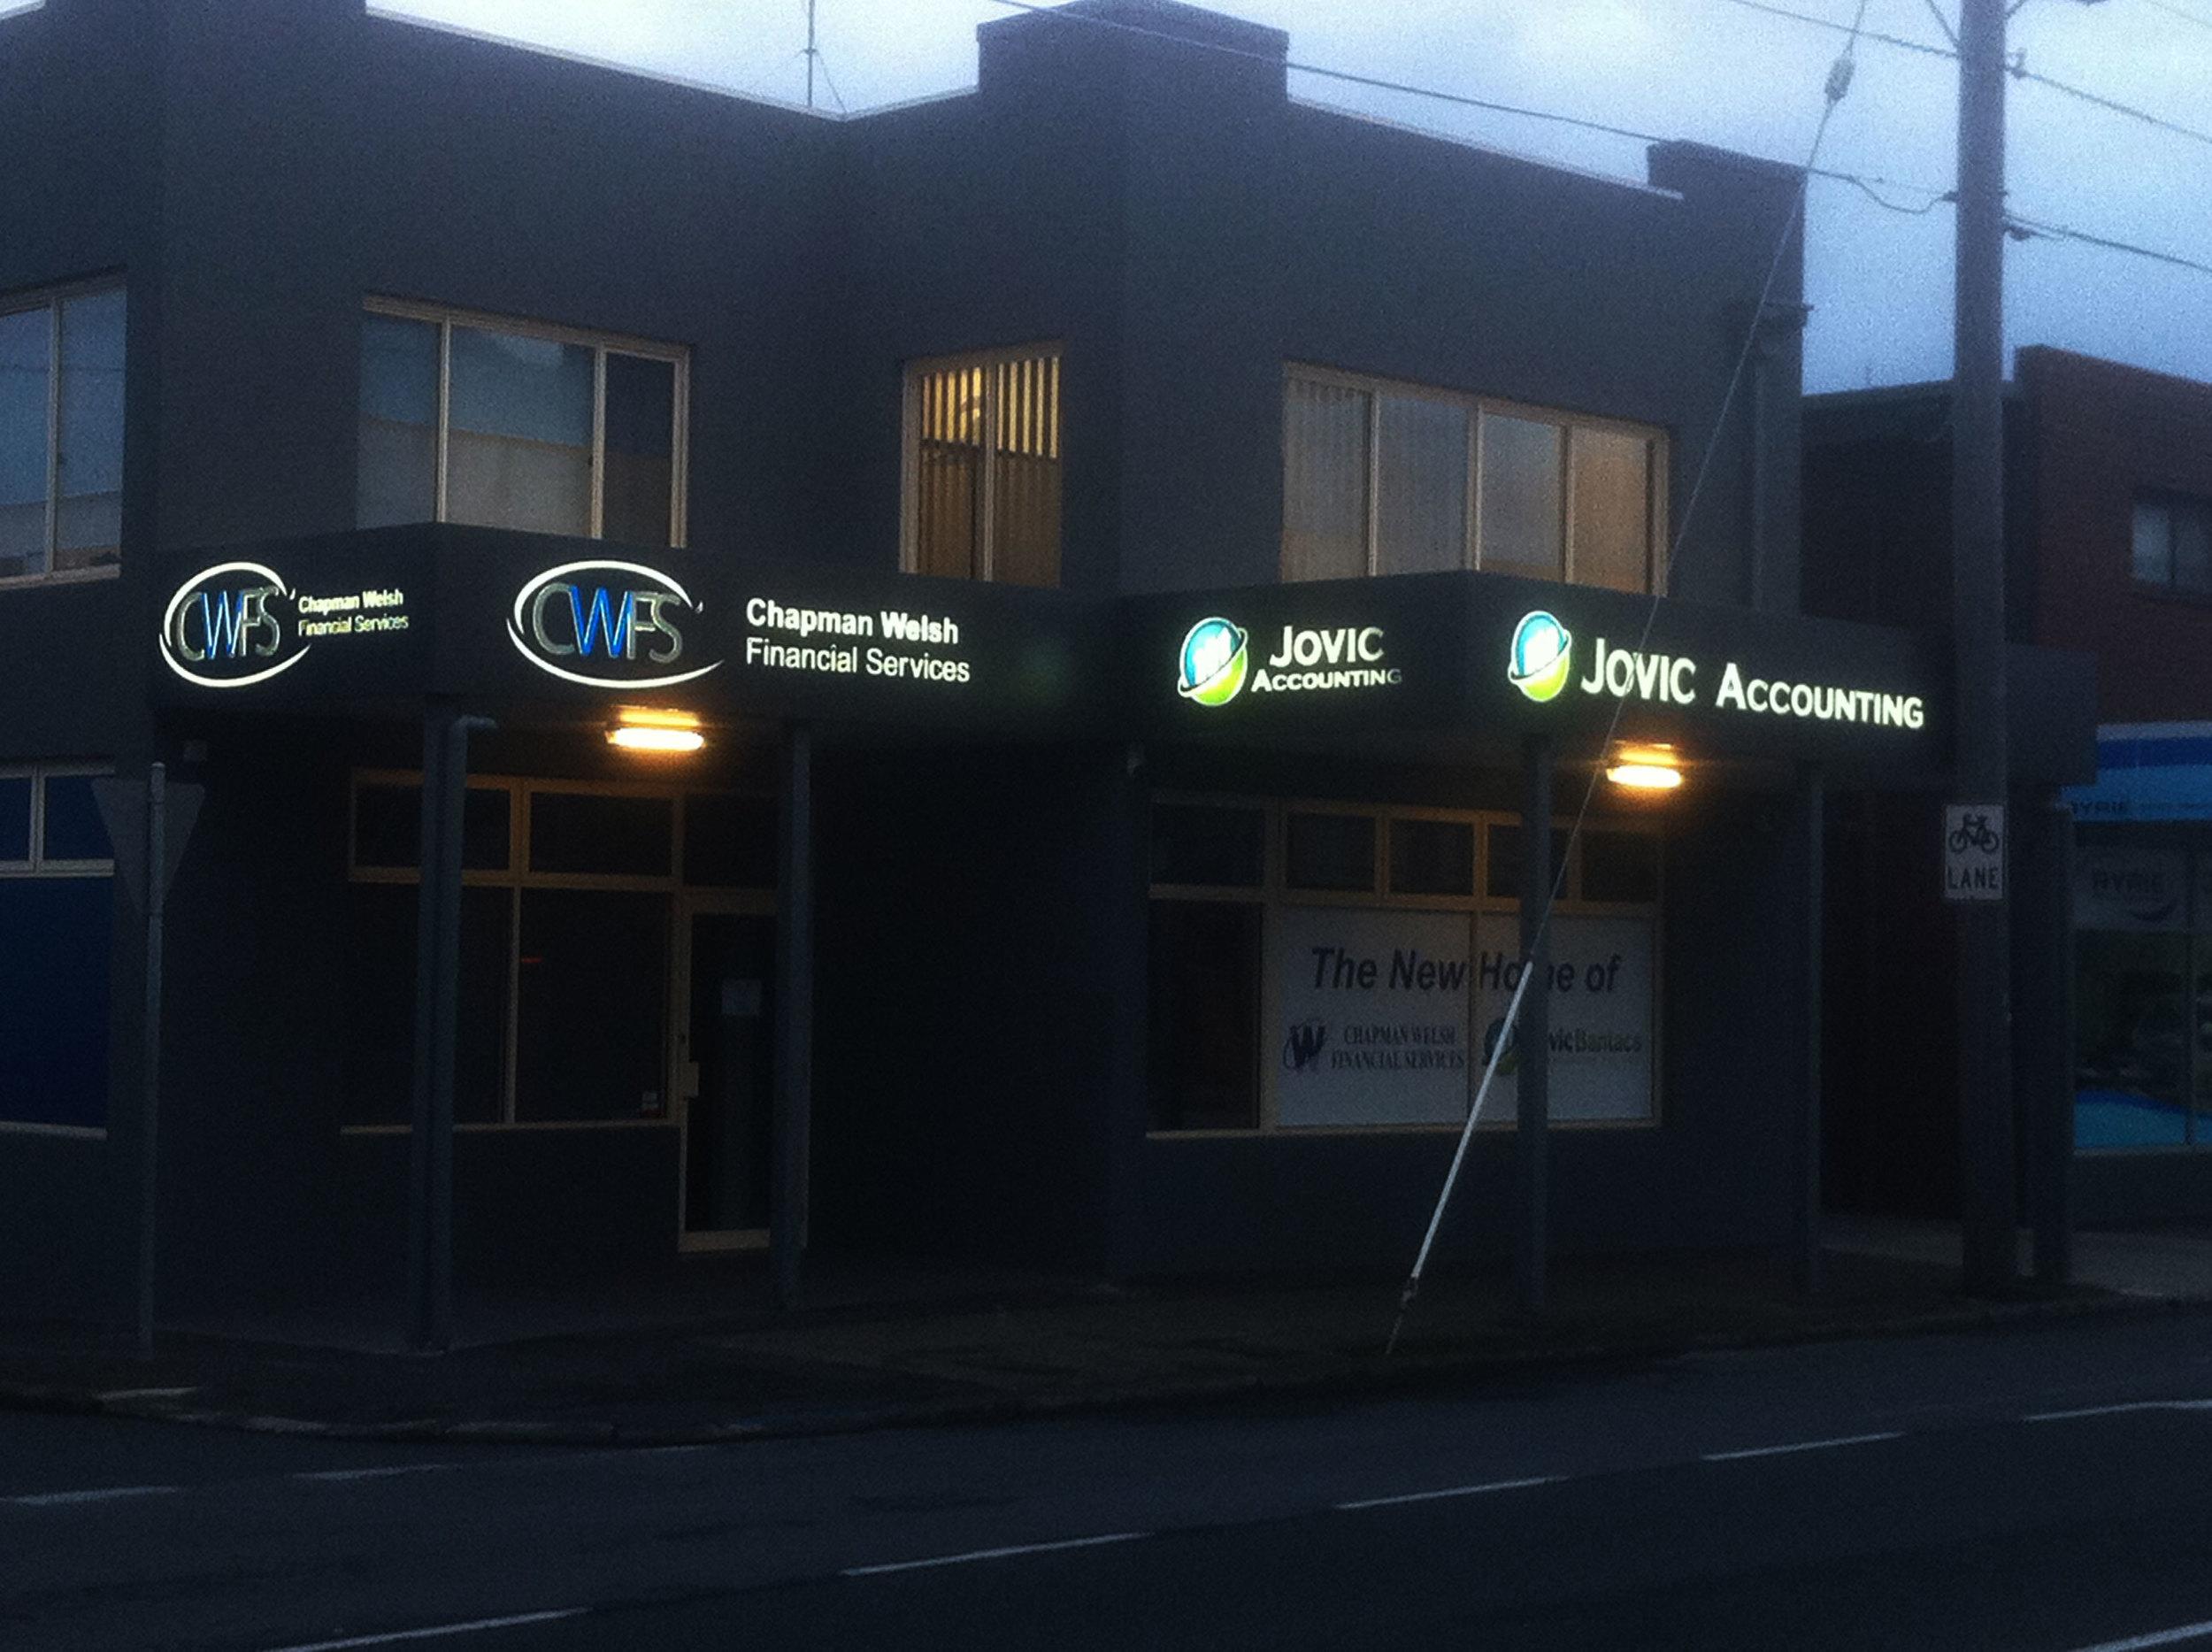 Jovic Accounting Corporate Signs Geelong.jpg